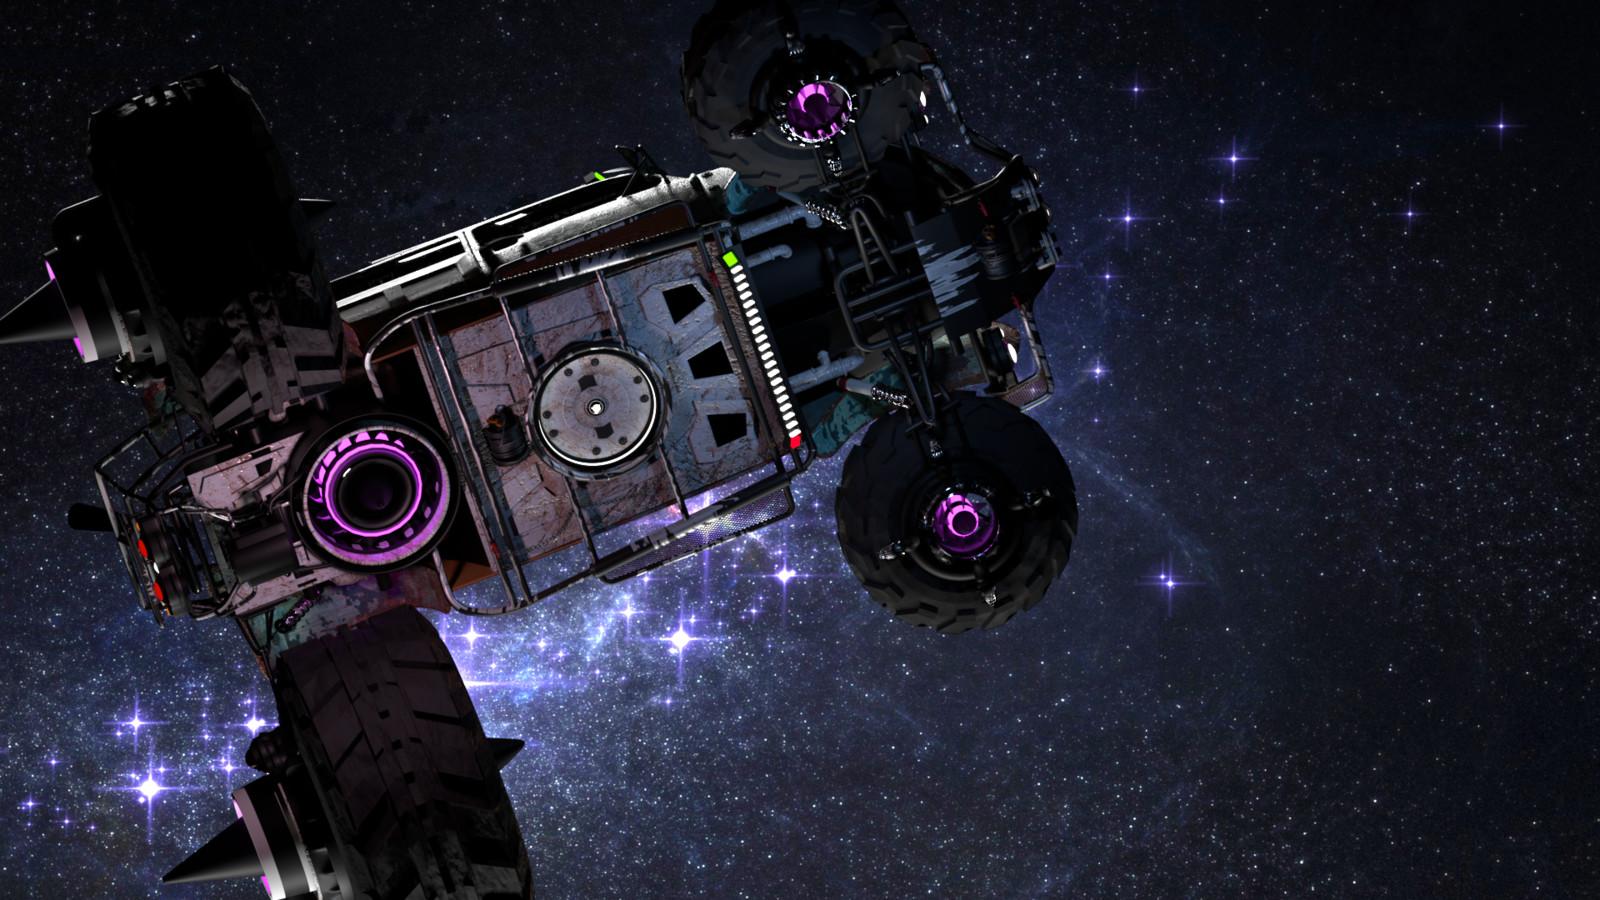 Baja Space Bug landing